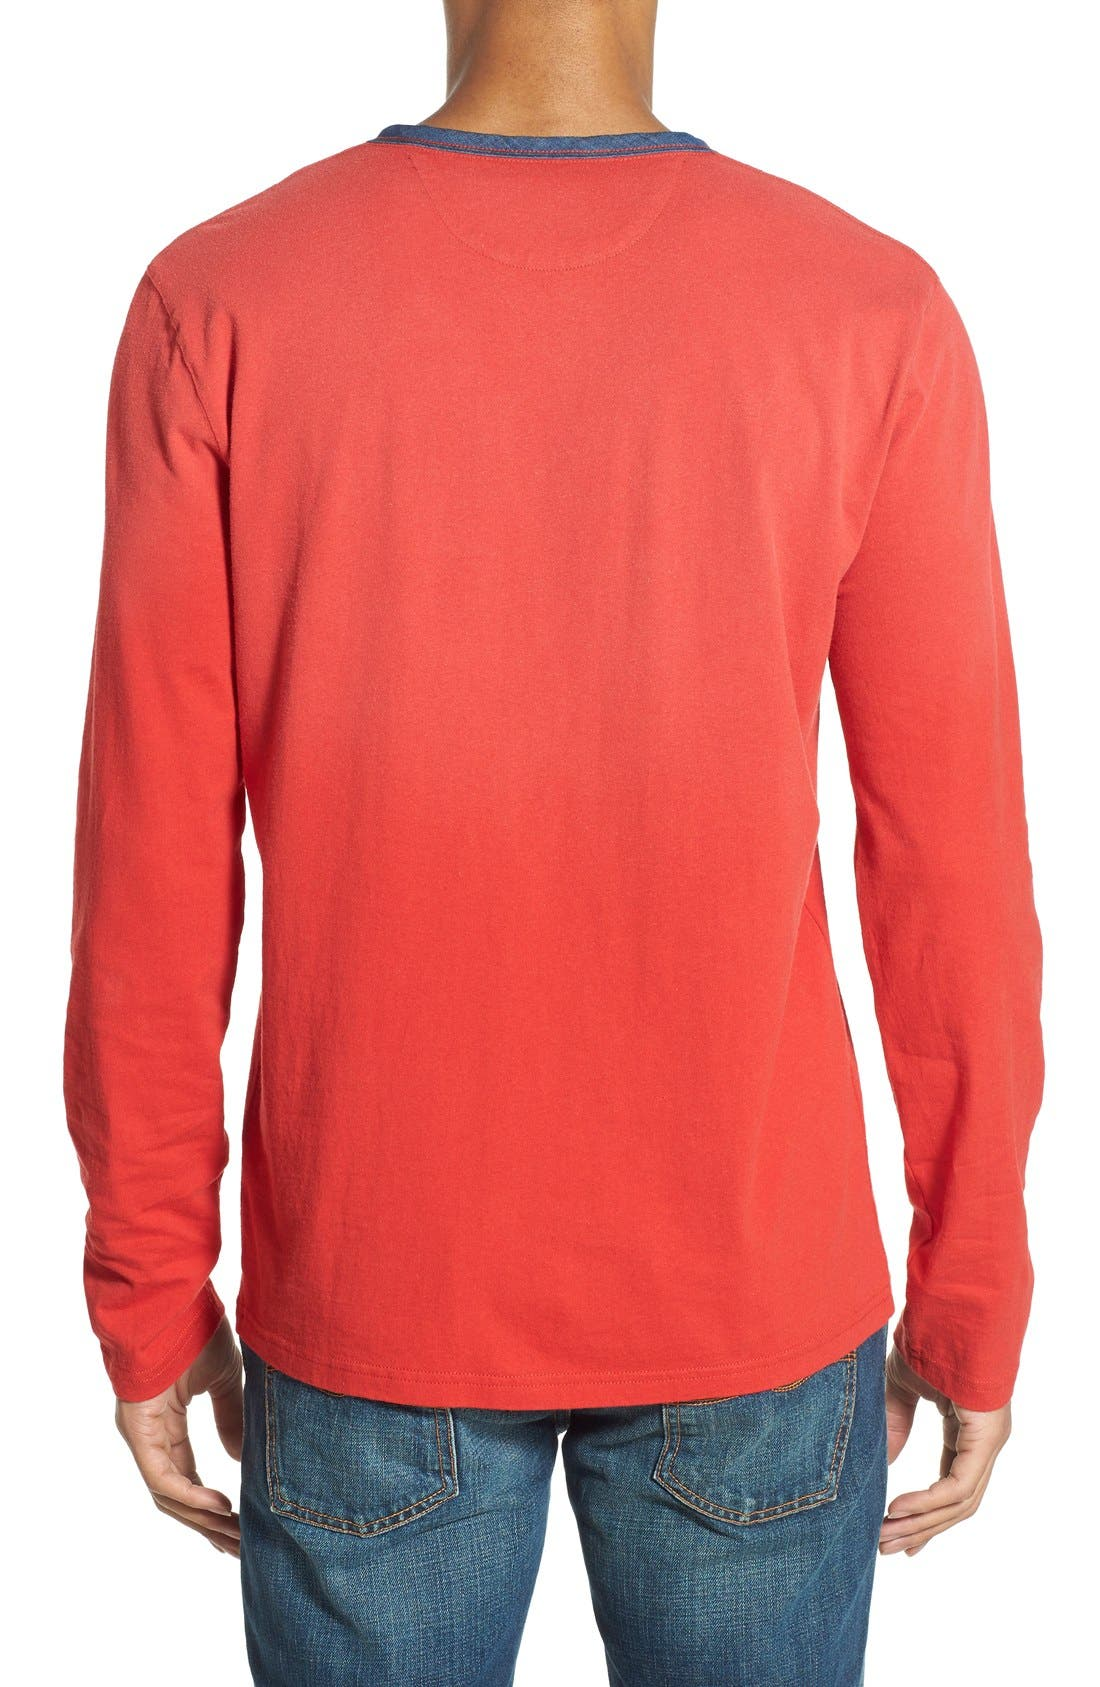 Alternate Image 2  - Lucky Brand 'Fashion' Long Sleeve Henley